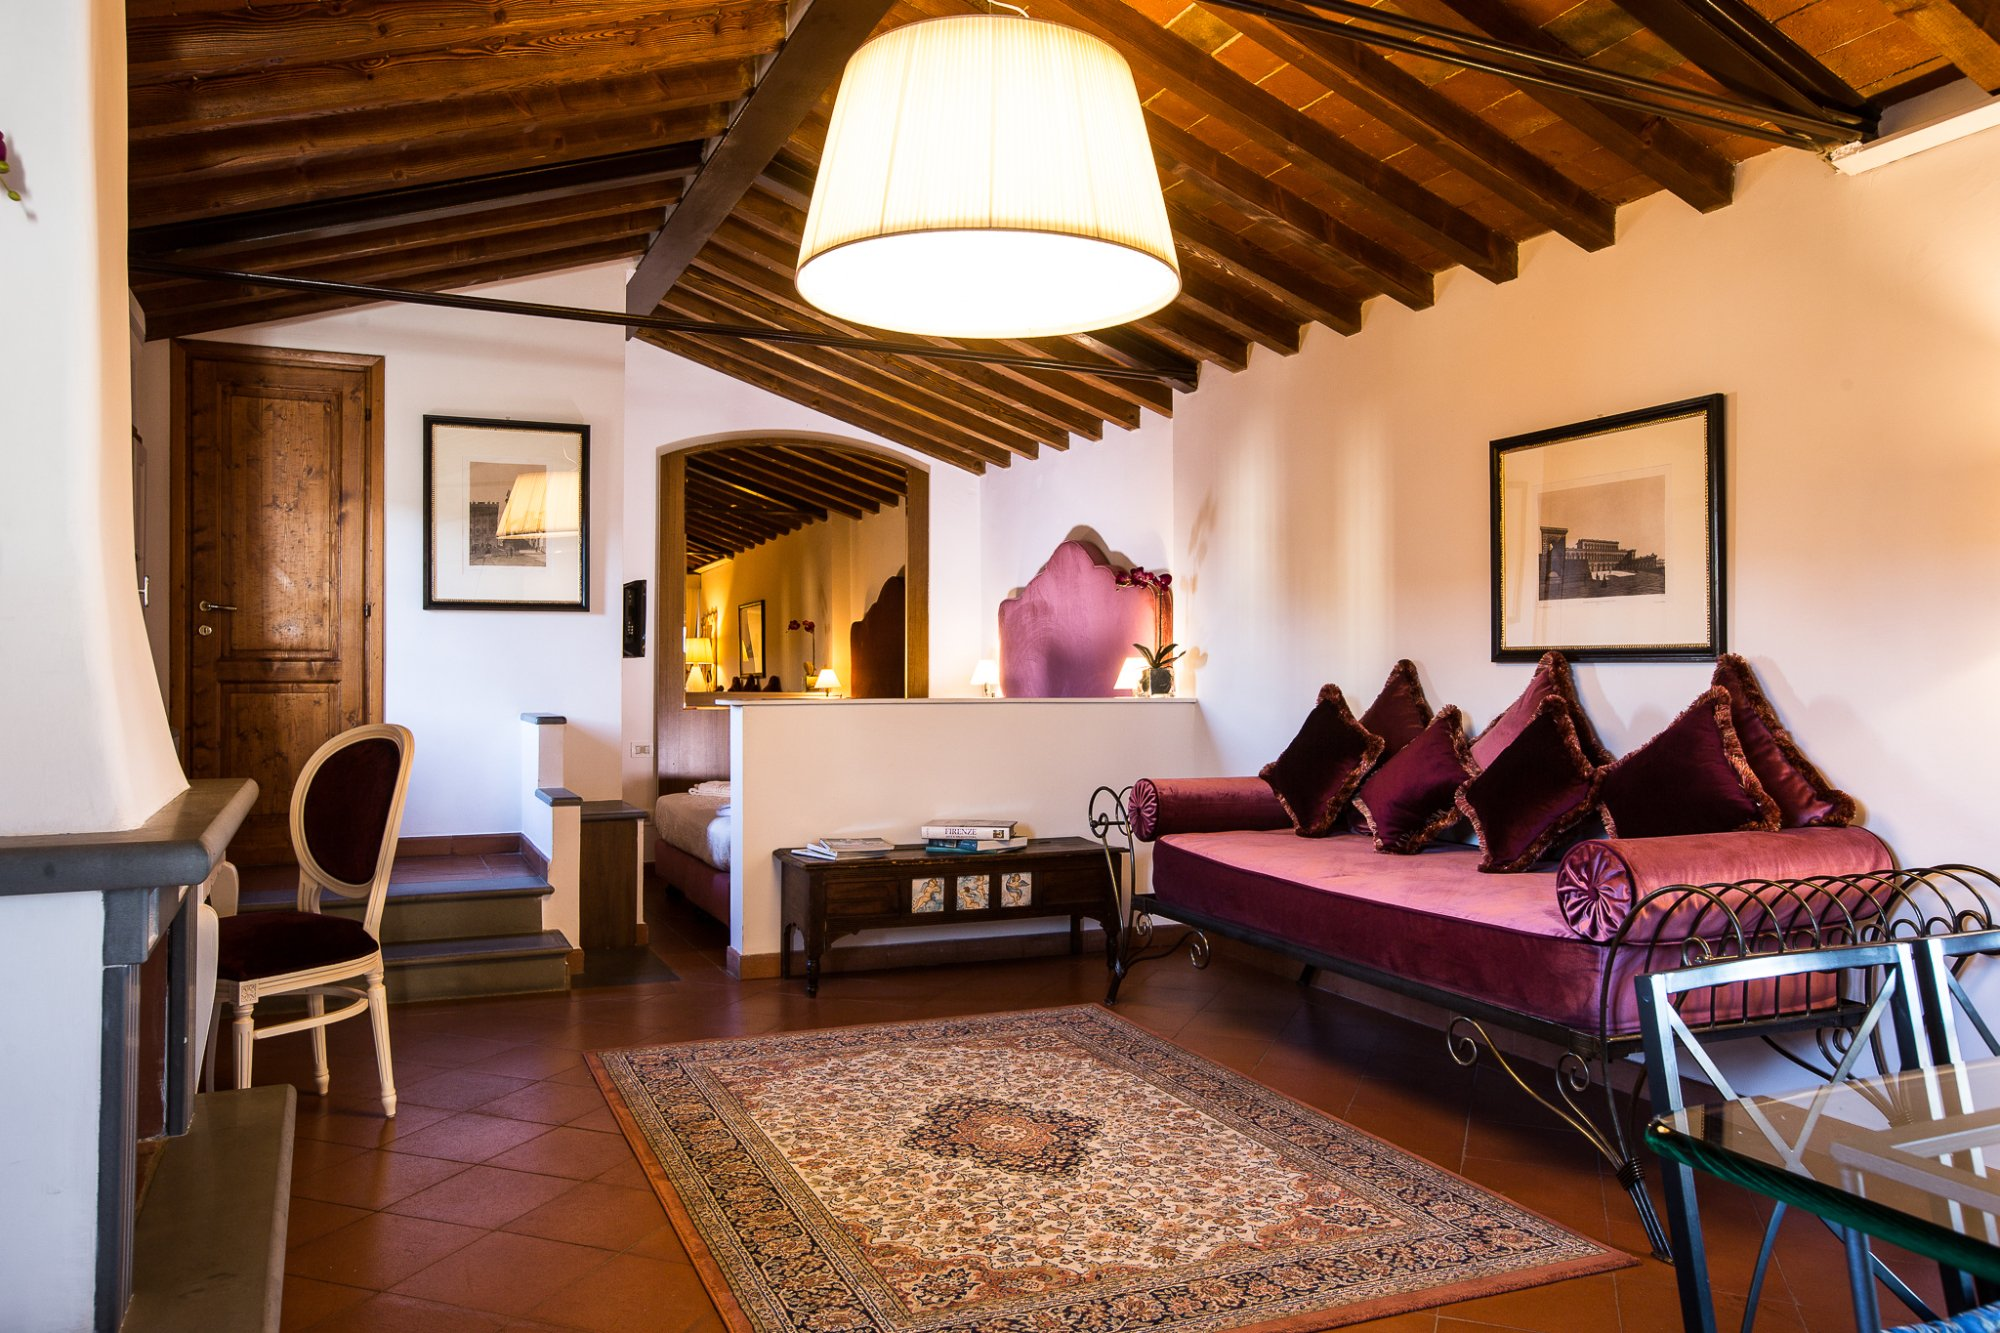 Hotel Burchianti – Florença, Itália